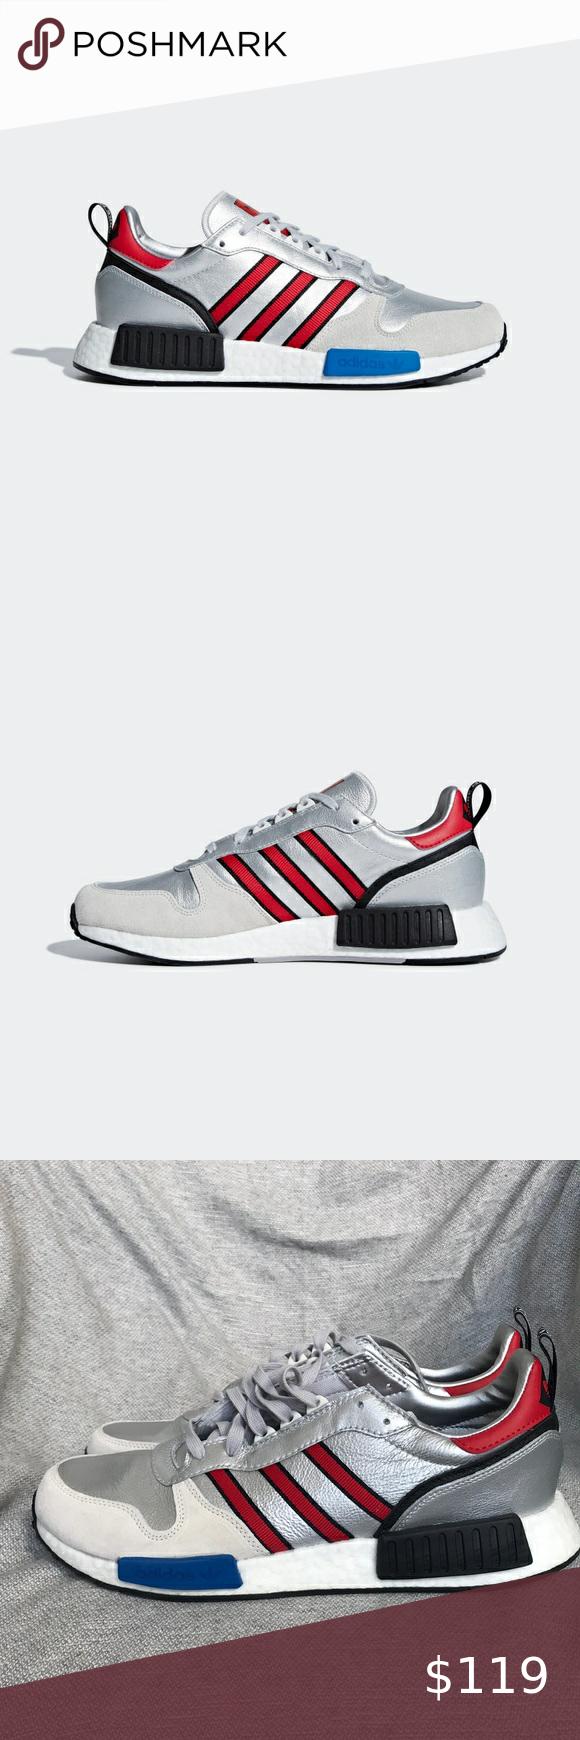 New* adidas Rising StarXR1 Shoes Size 13 | New adidas, Shoes ...